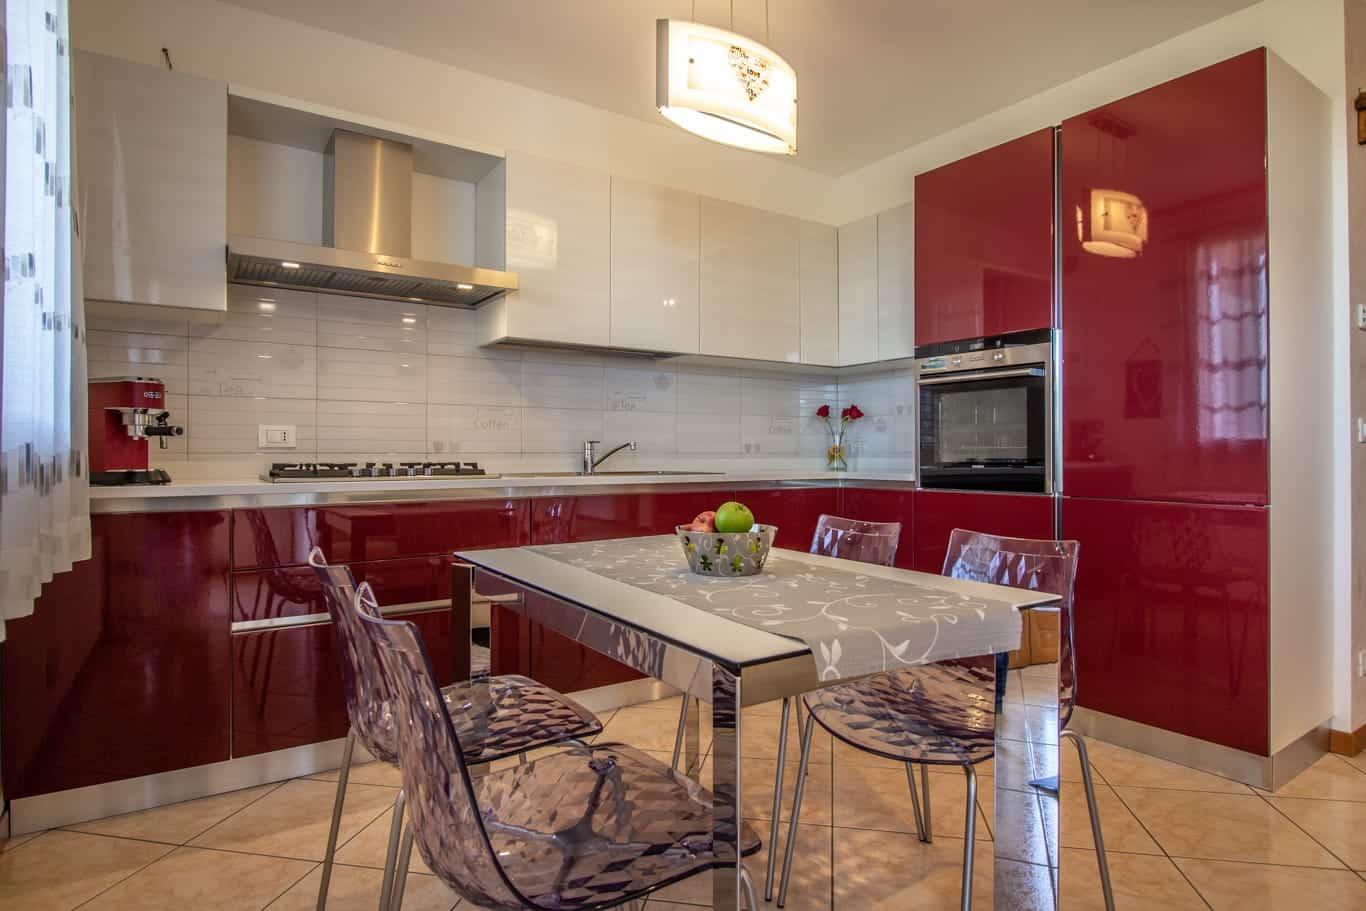 Appartamento_cimpello (2 of 8)